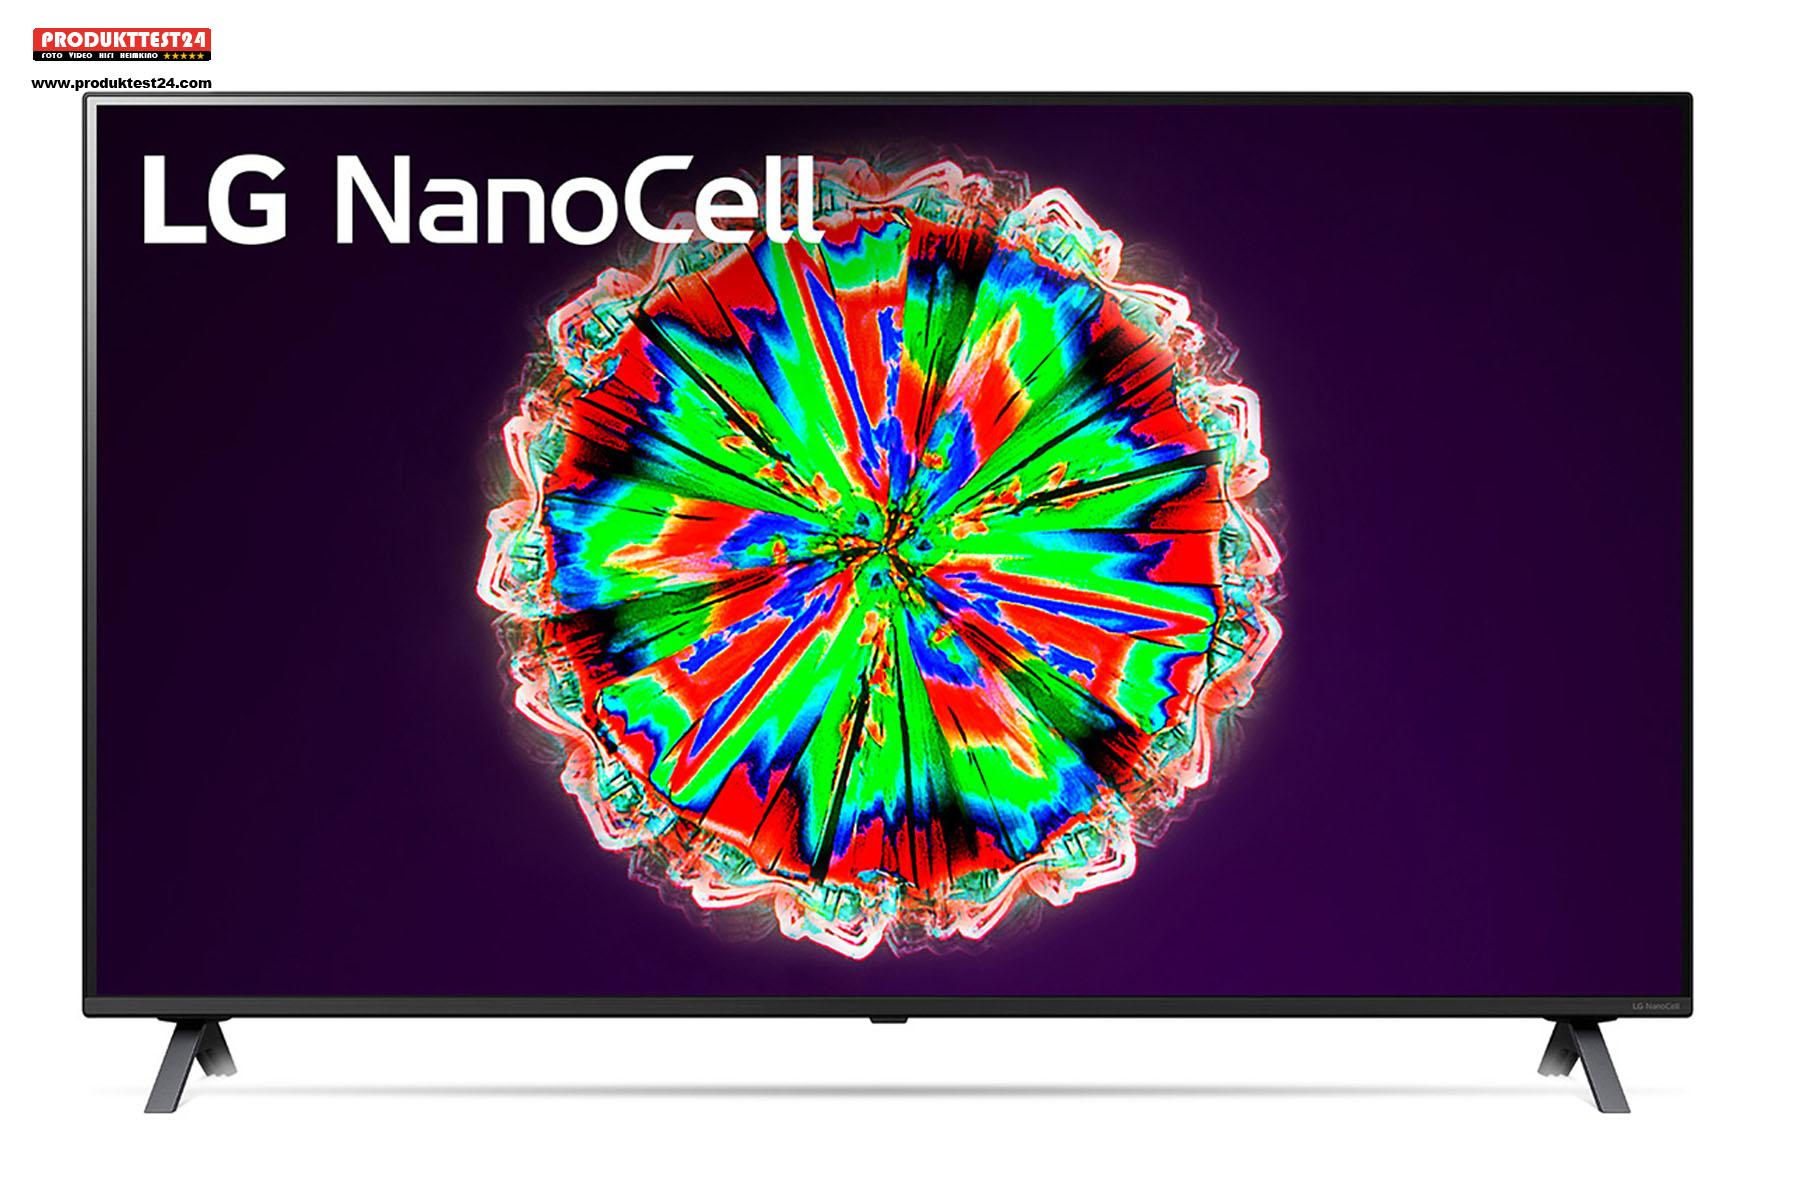 Der 55 Zoll LG 55NANO806NA 4K-Fernseher mit NanoCell Technik